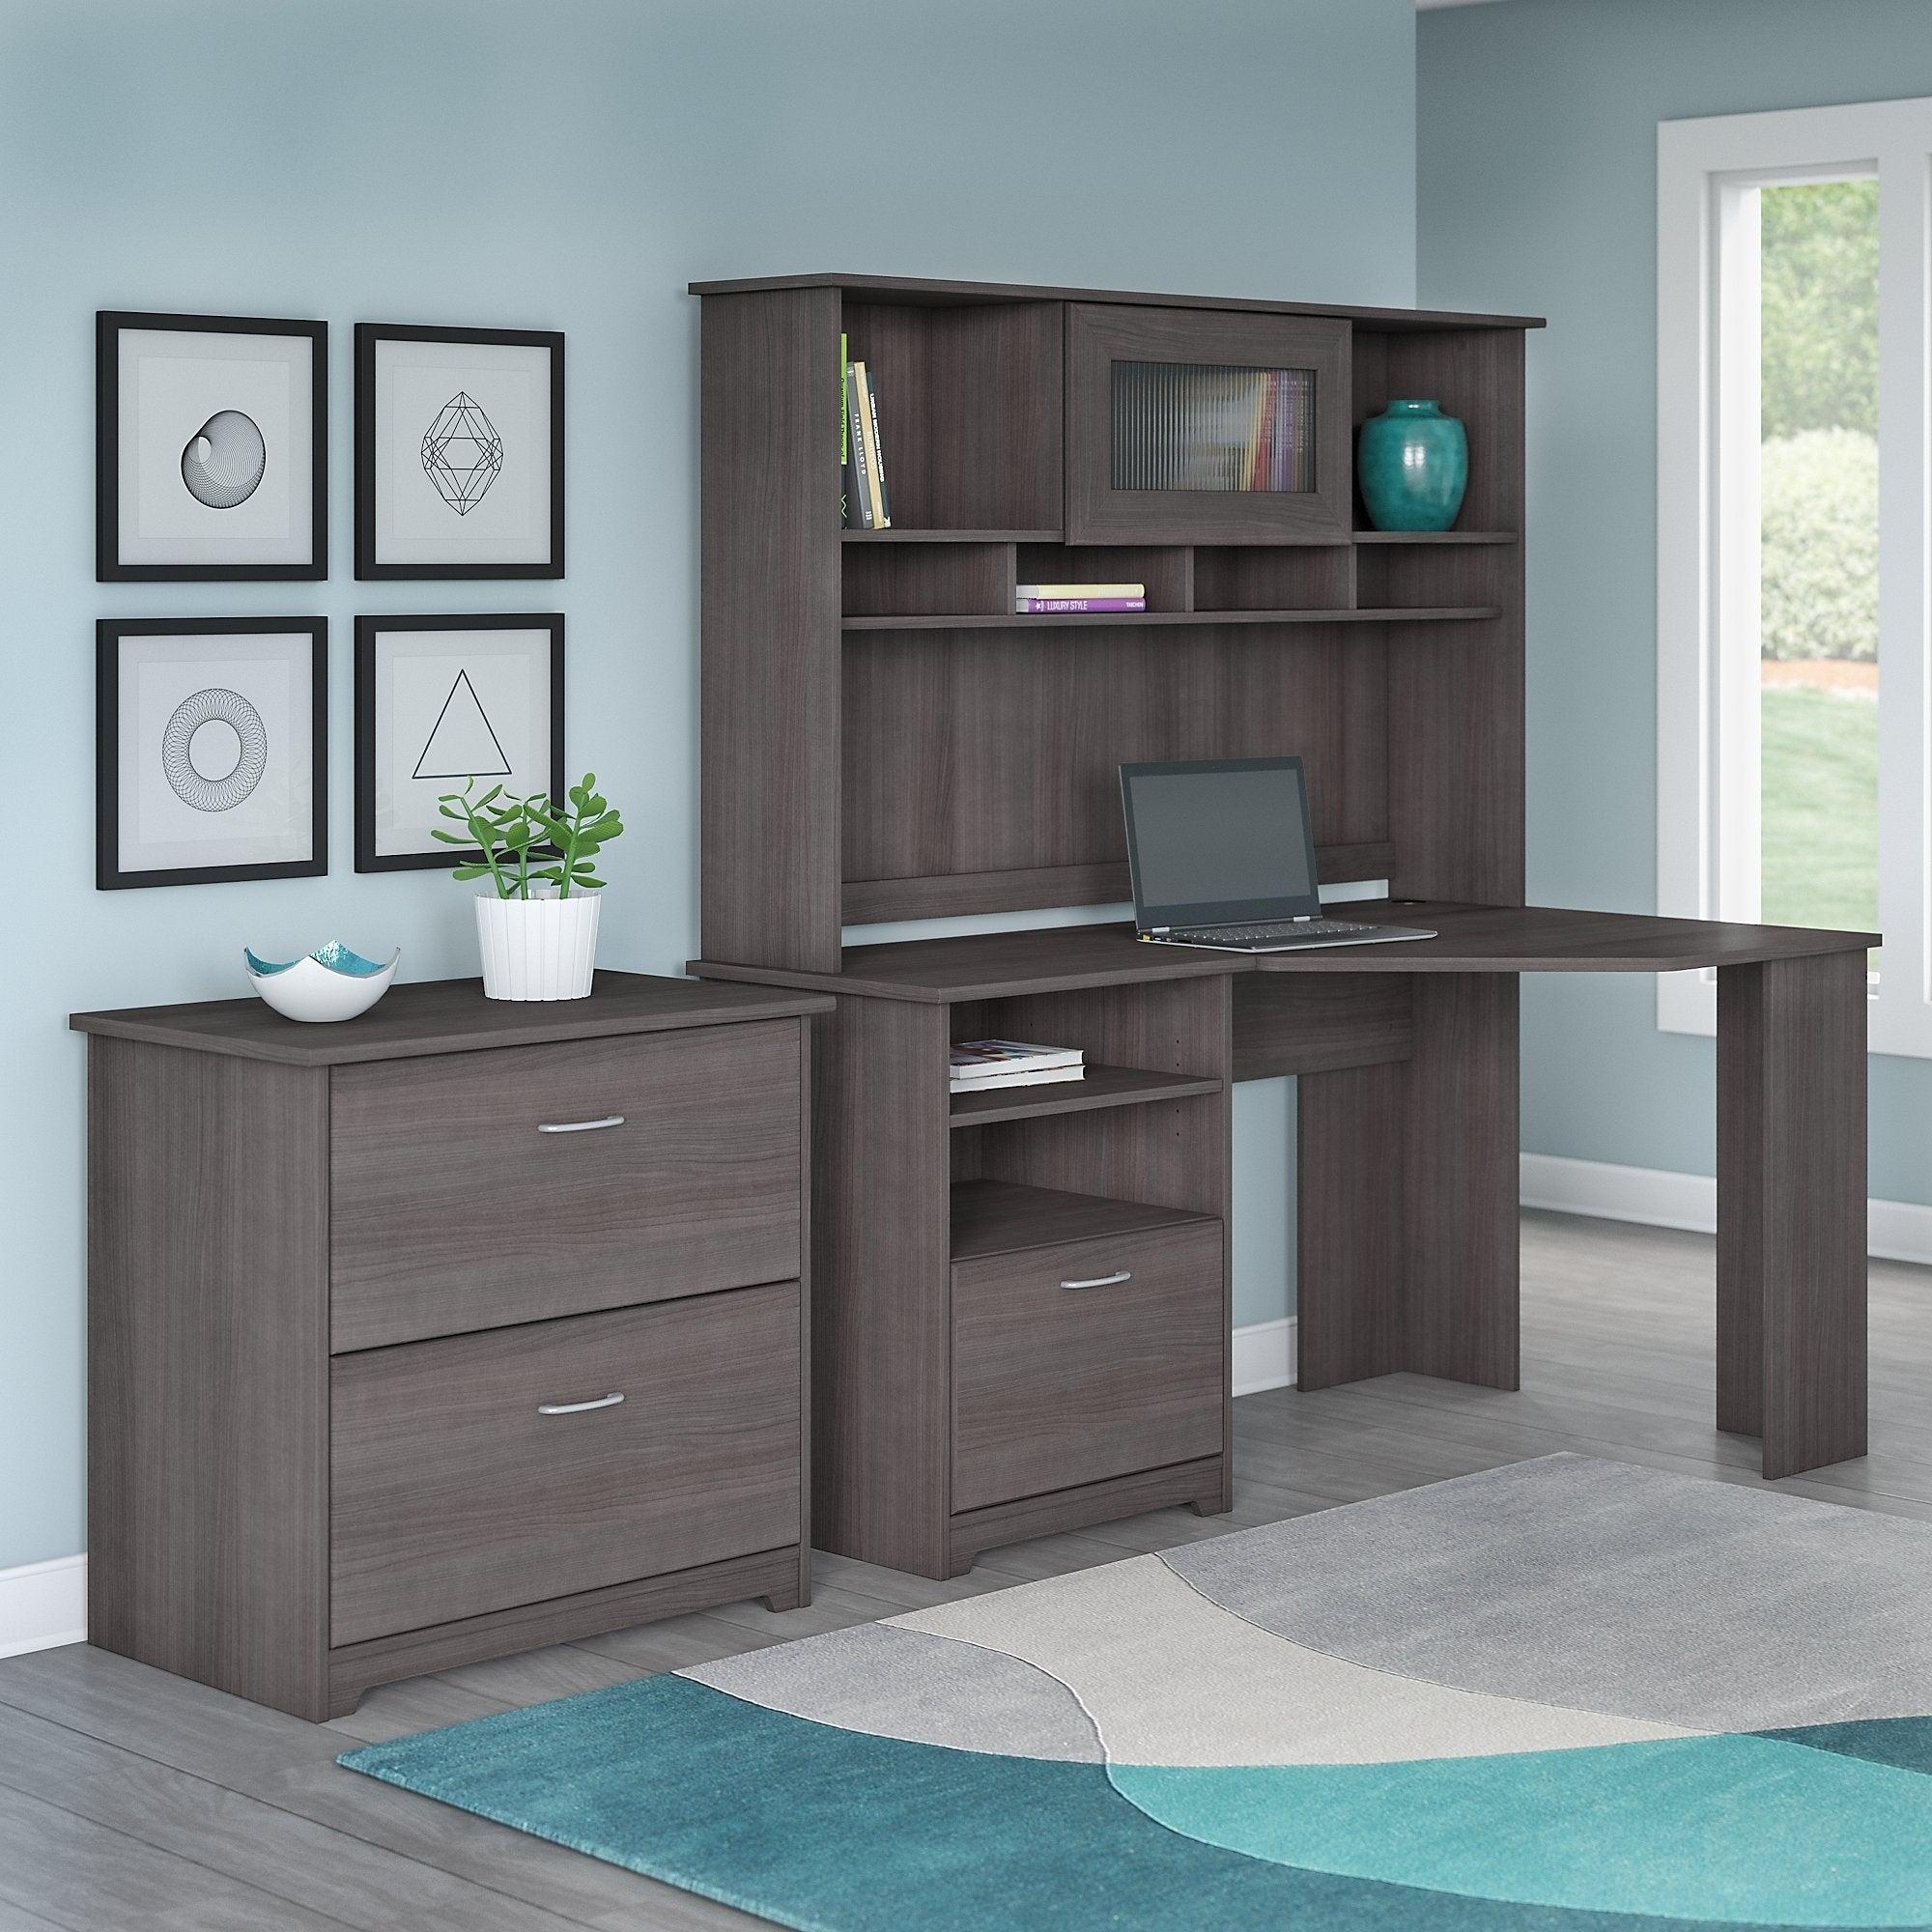 bush cabot corner desk with hutch and 2 drawer file cabinet in heather gray ebay. Black Bedroom Furniture Sets. Home Design Ideas